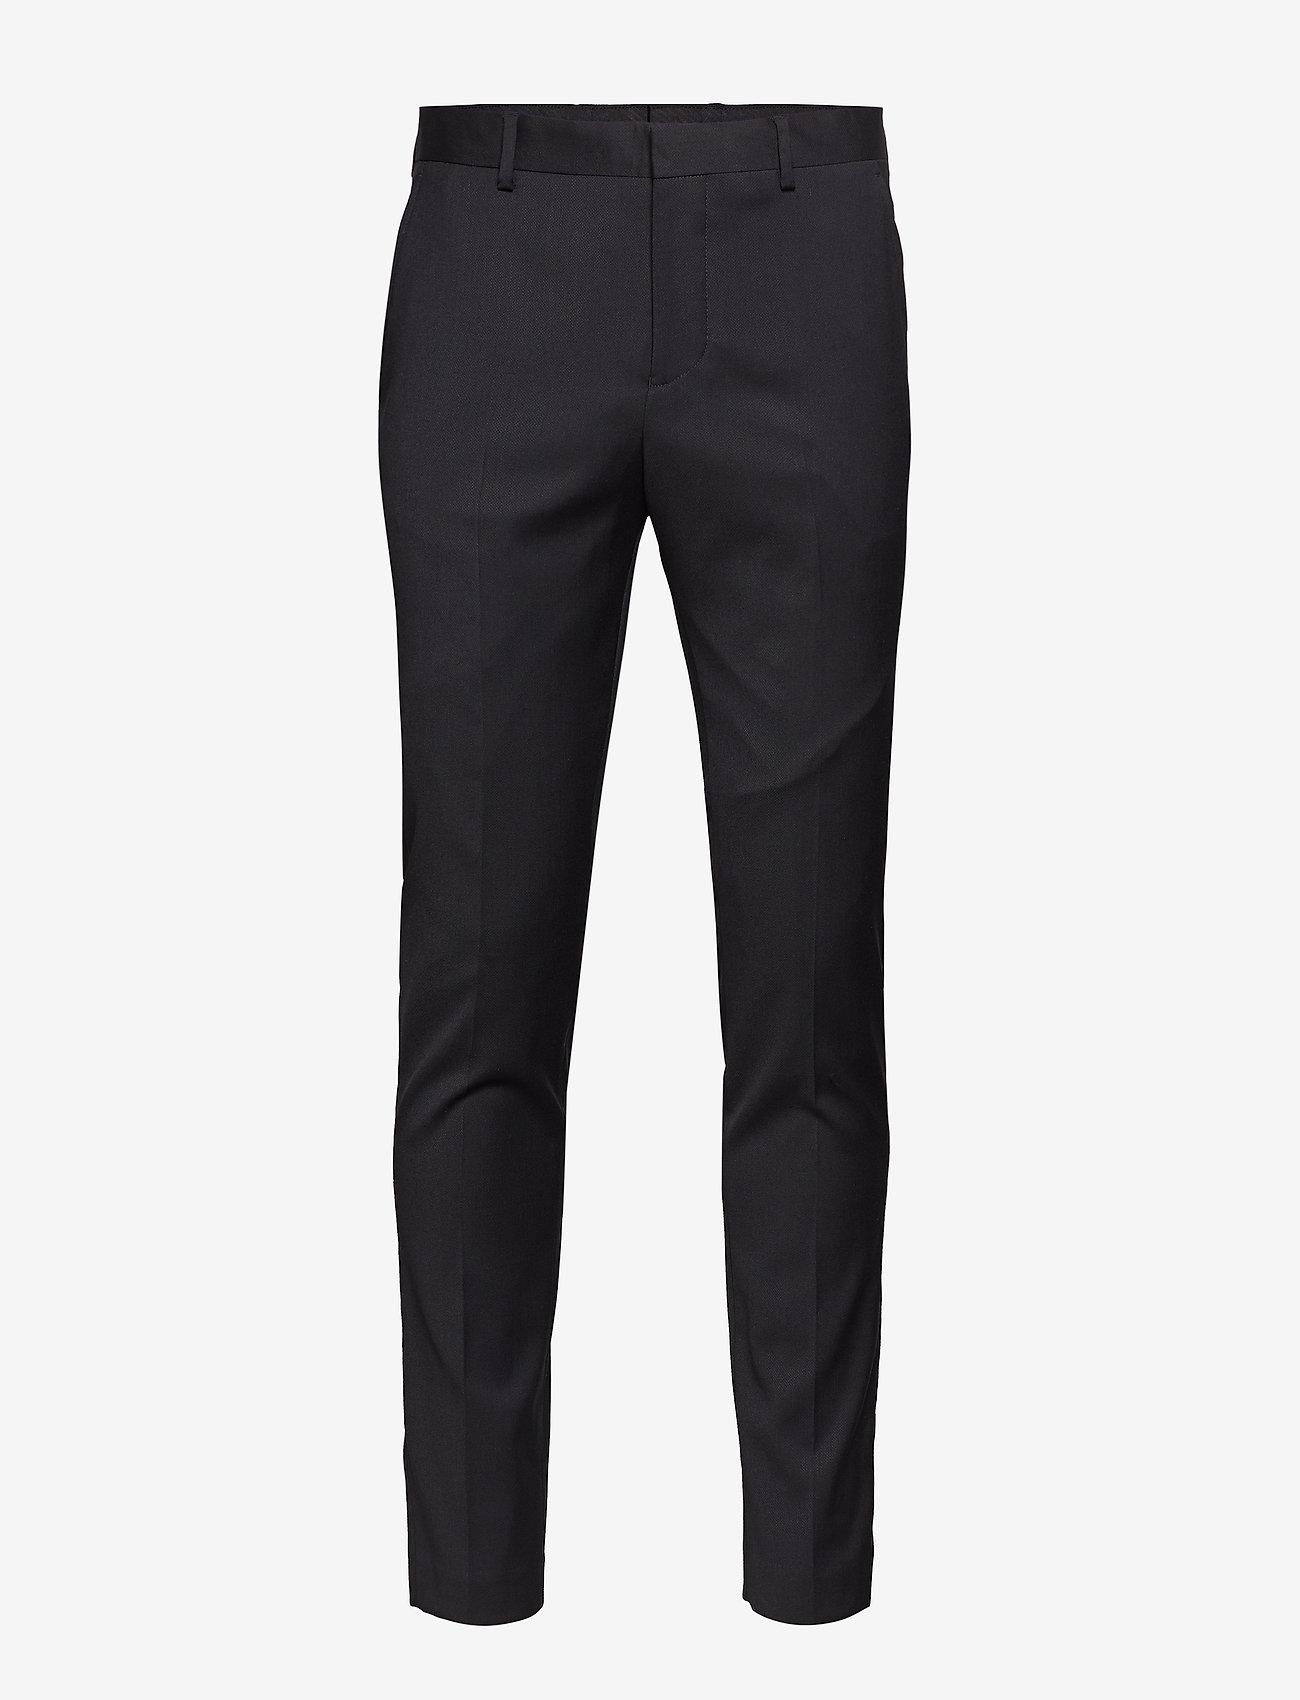 Selected Homme - SLHSLIM-MYLOBILL BLACK TRS B NOOS - suitbukser - black - 0